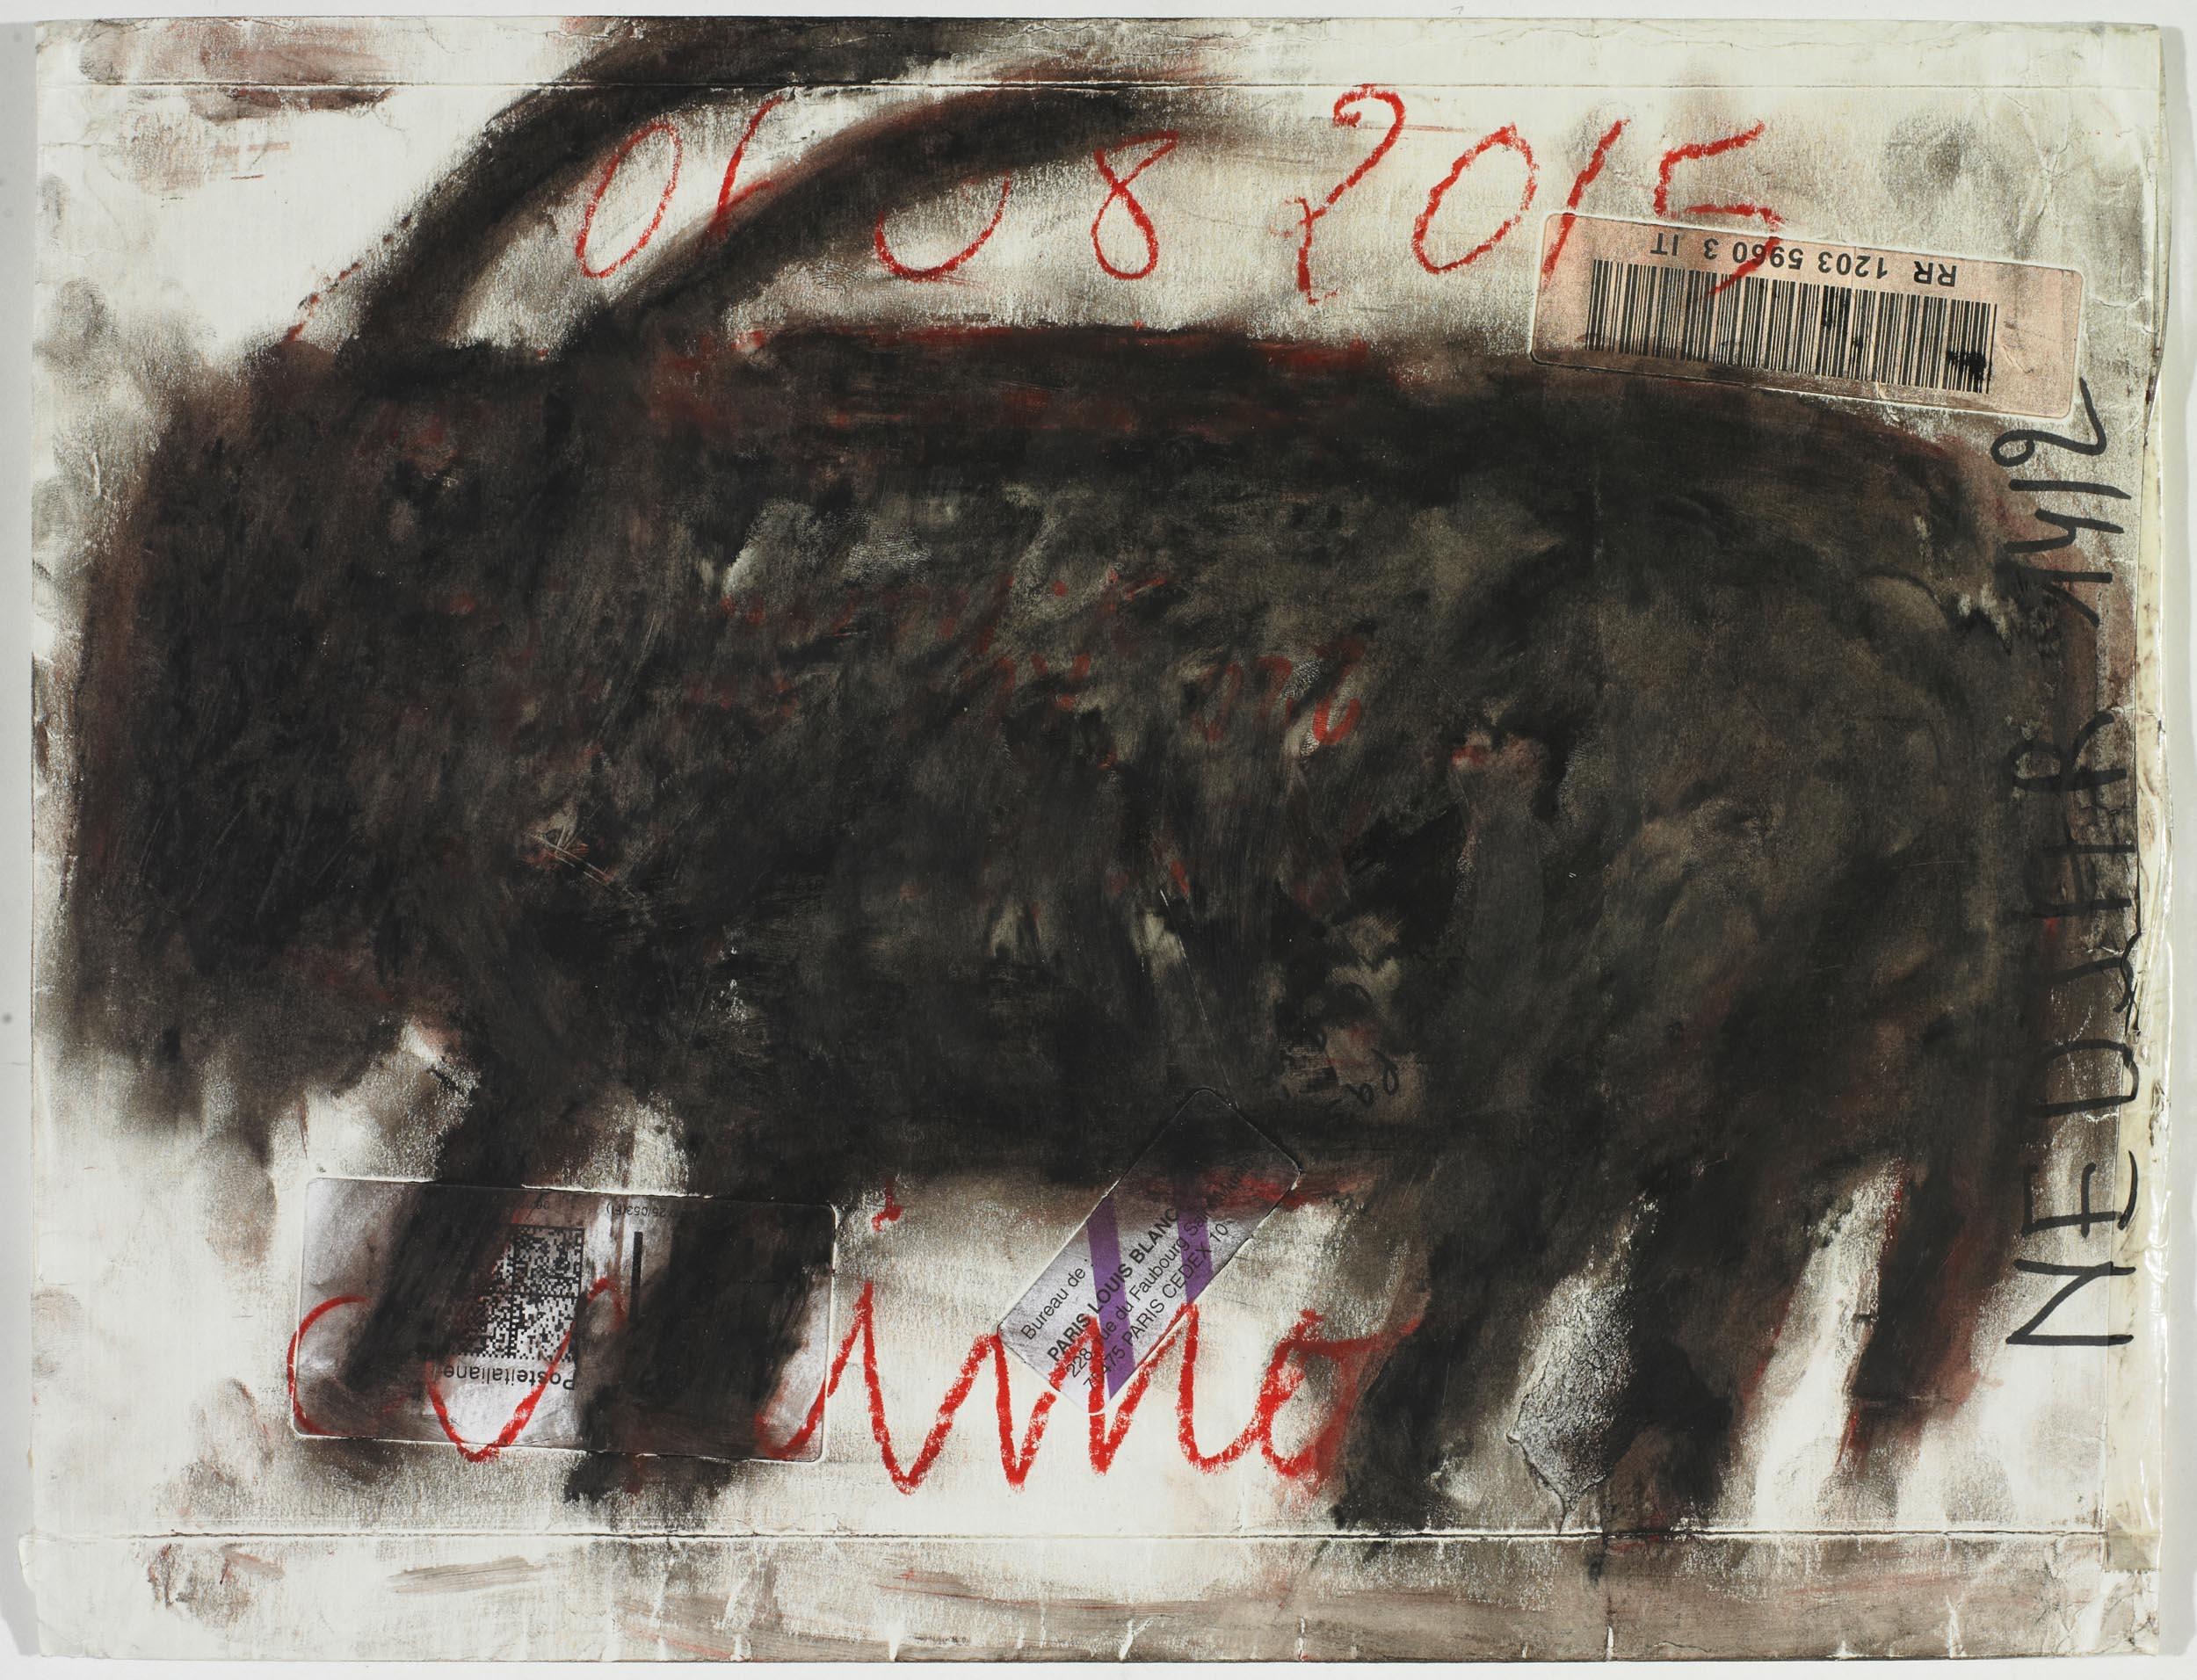 nedjar michel - untitled | Paris St.-Martin 2015 / untitled | Paris St.-Martin 2015